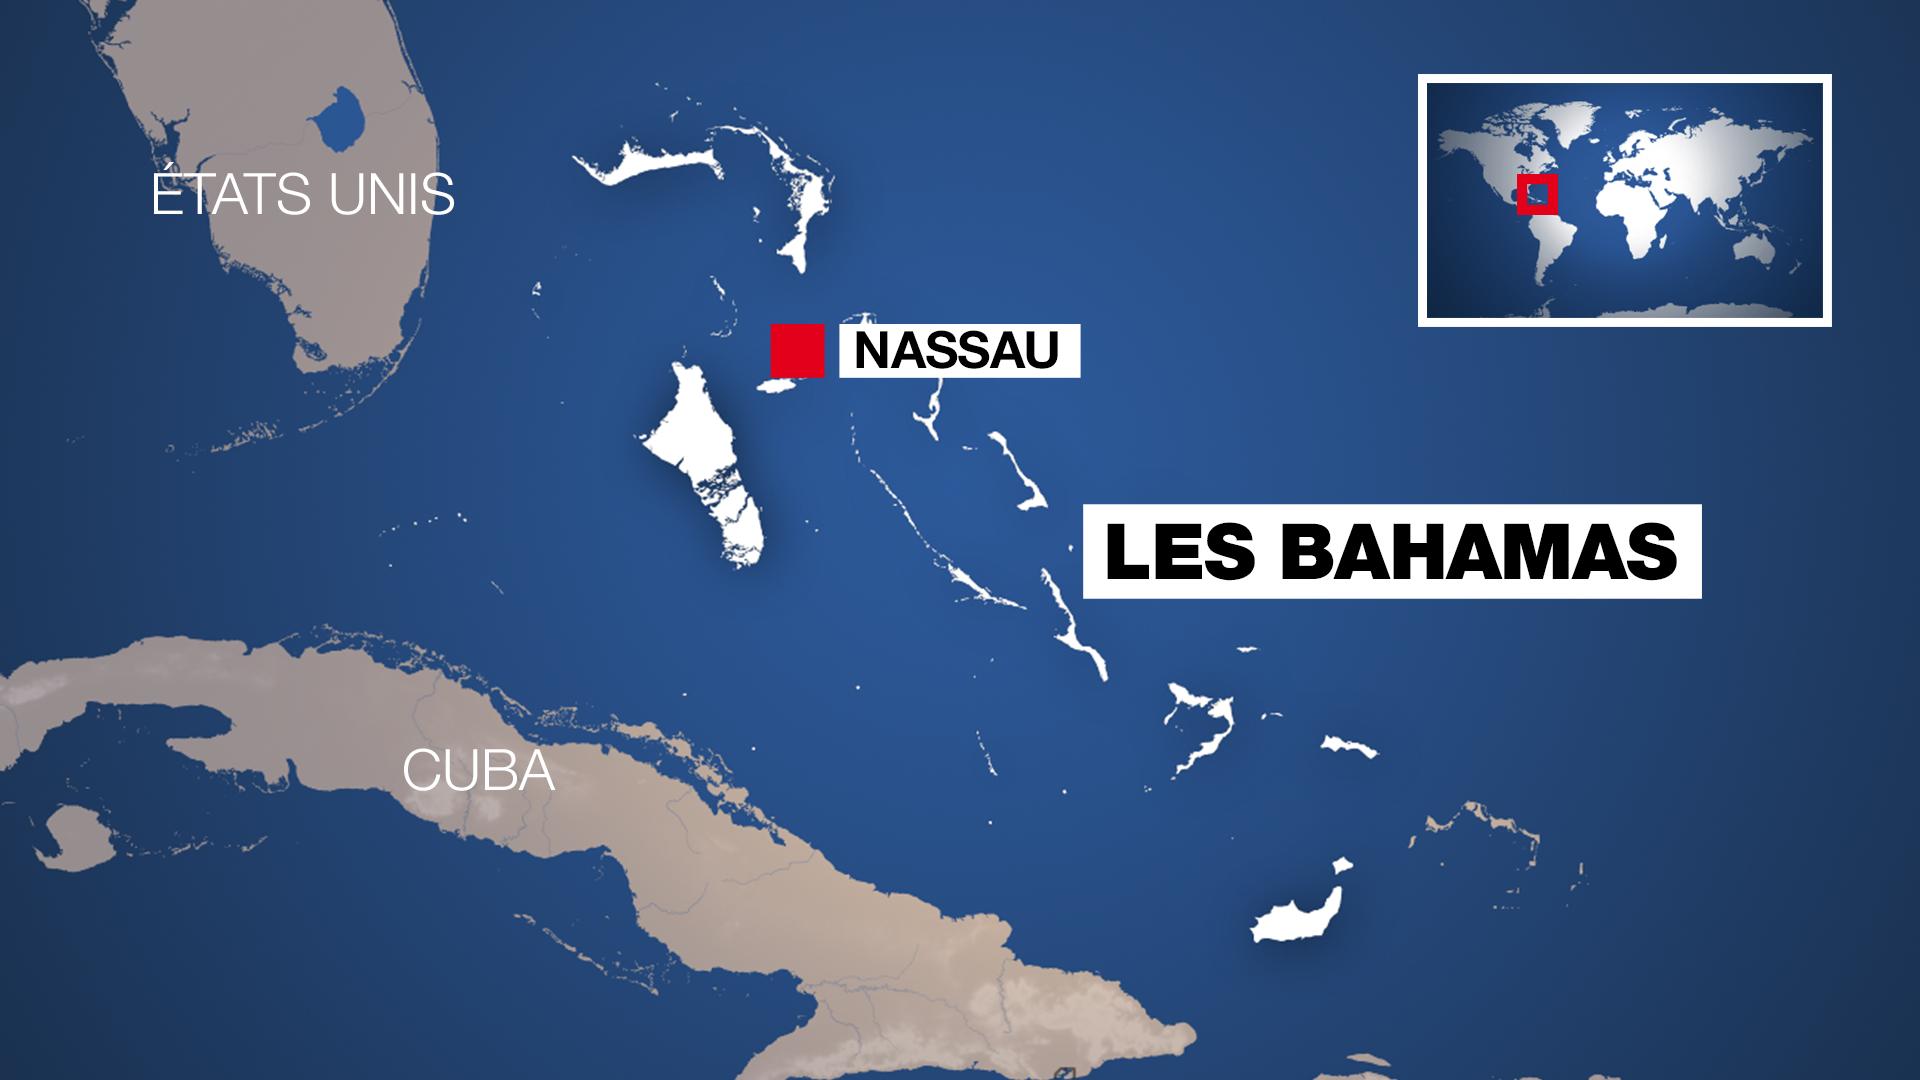 L'archipel des Bahamas.